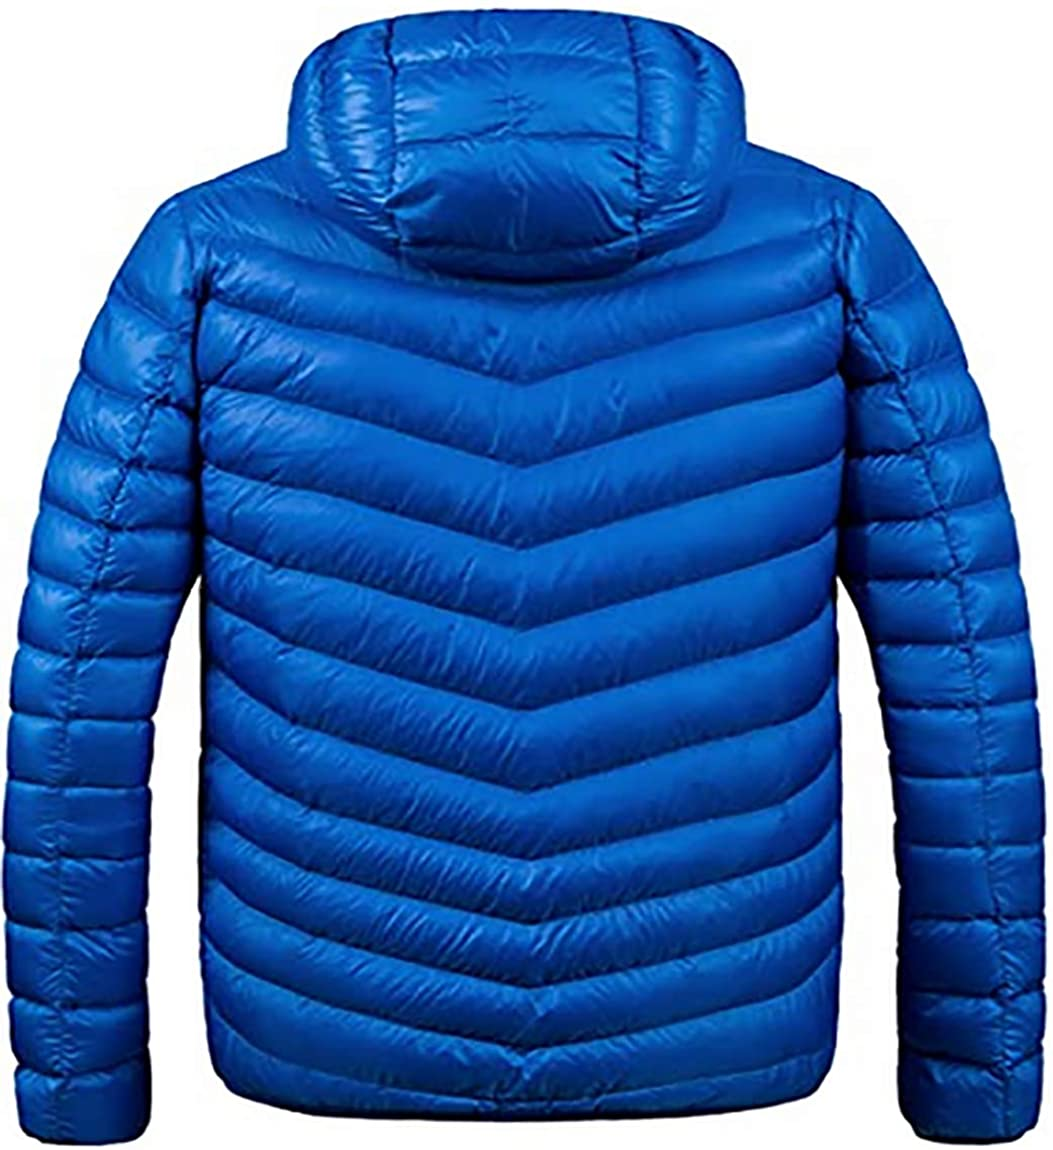 iphonepassteCK Men's Hooded Down Jacket Blue S